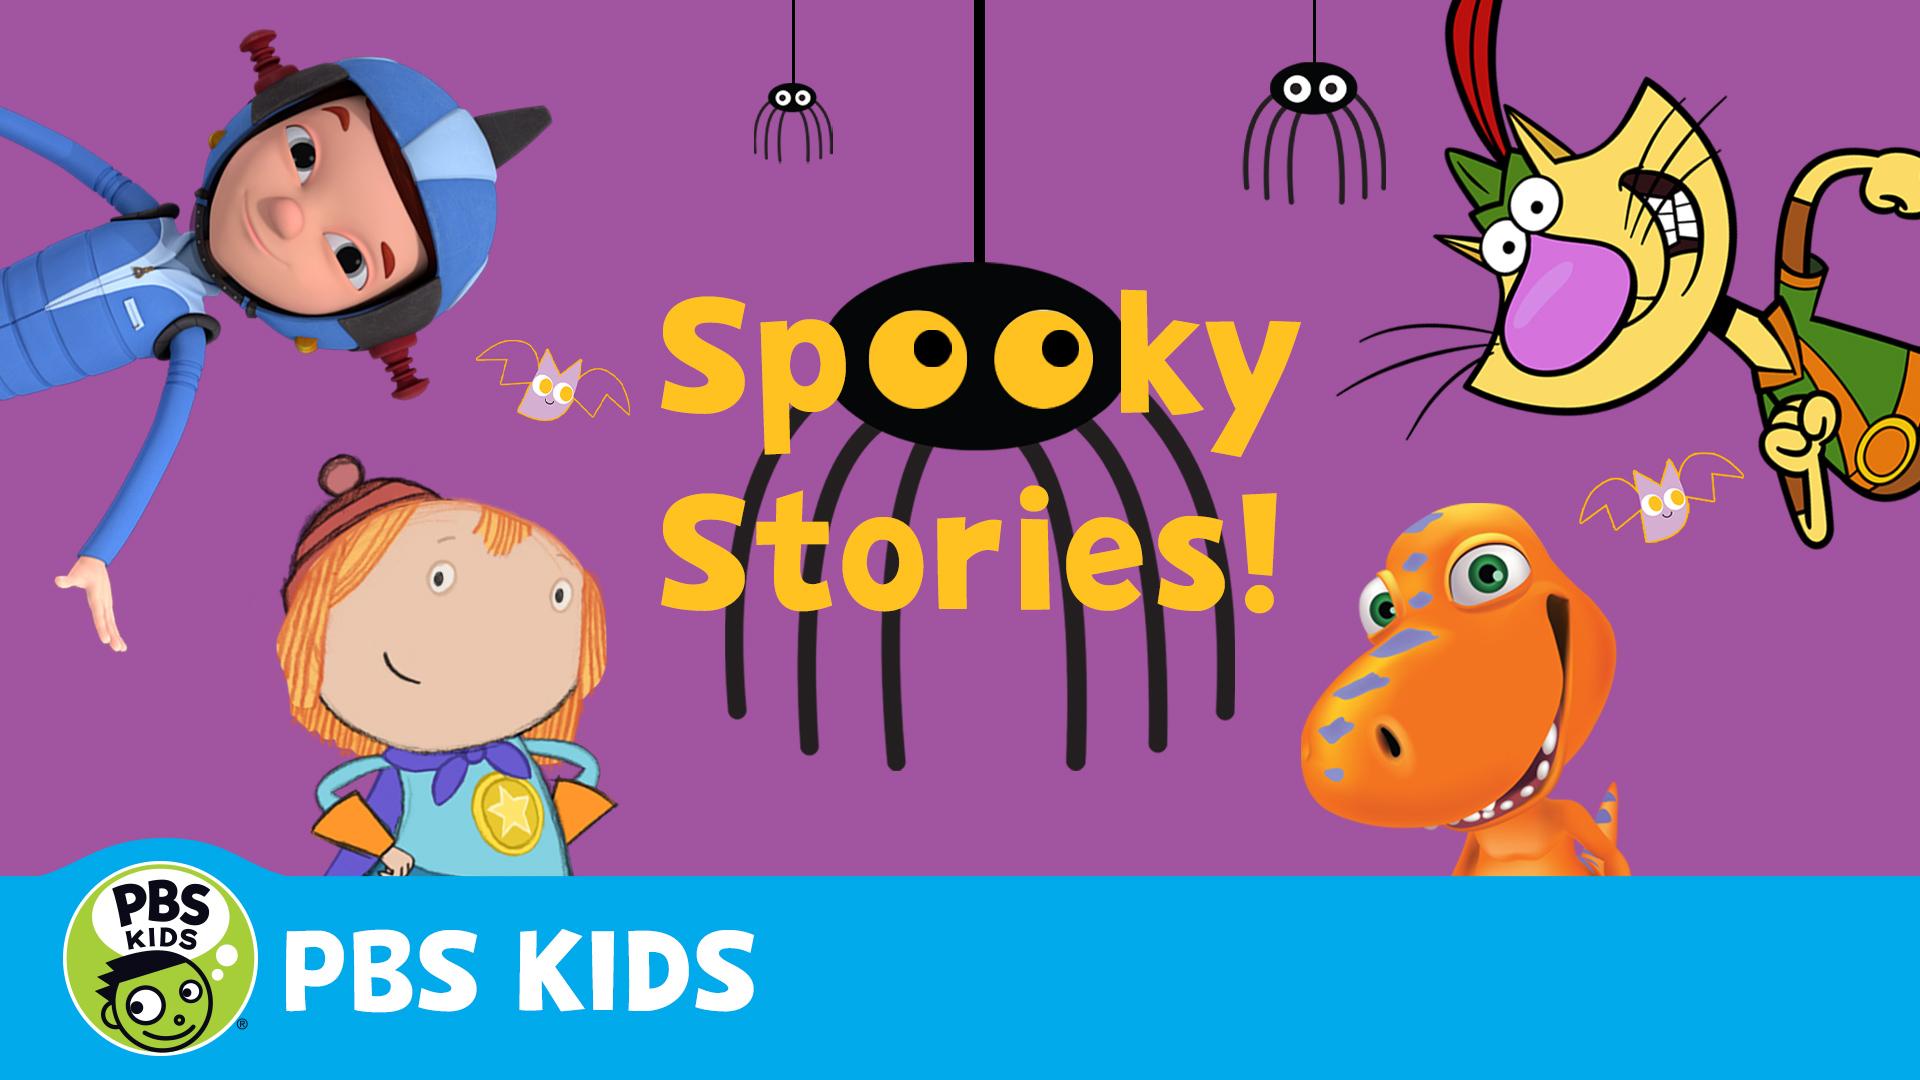 PBS KIDS: Spooky Stories! Season 1